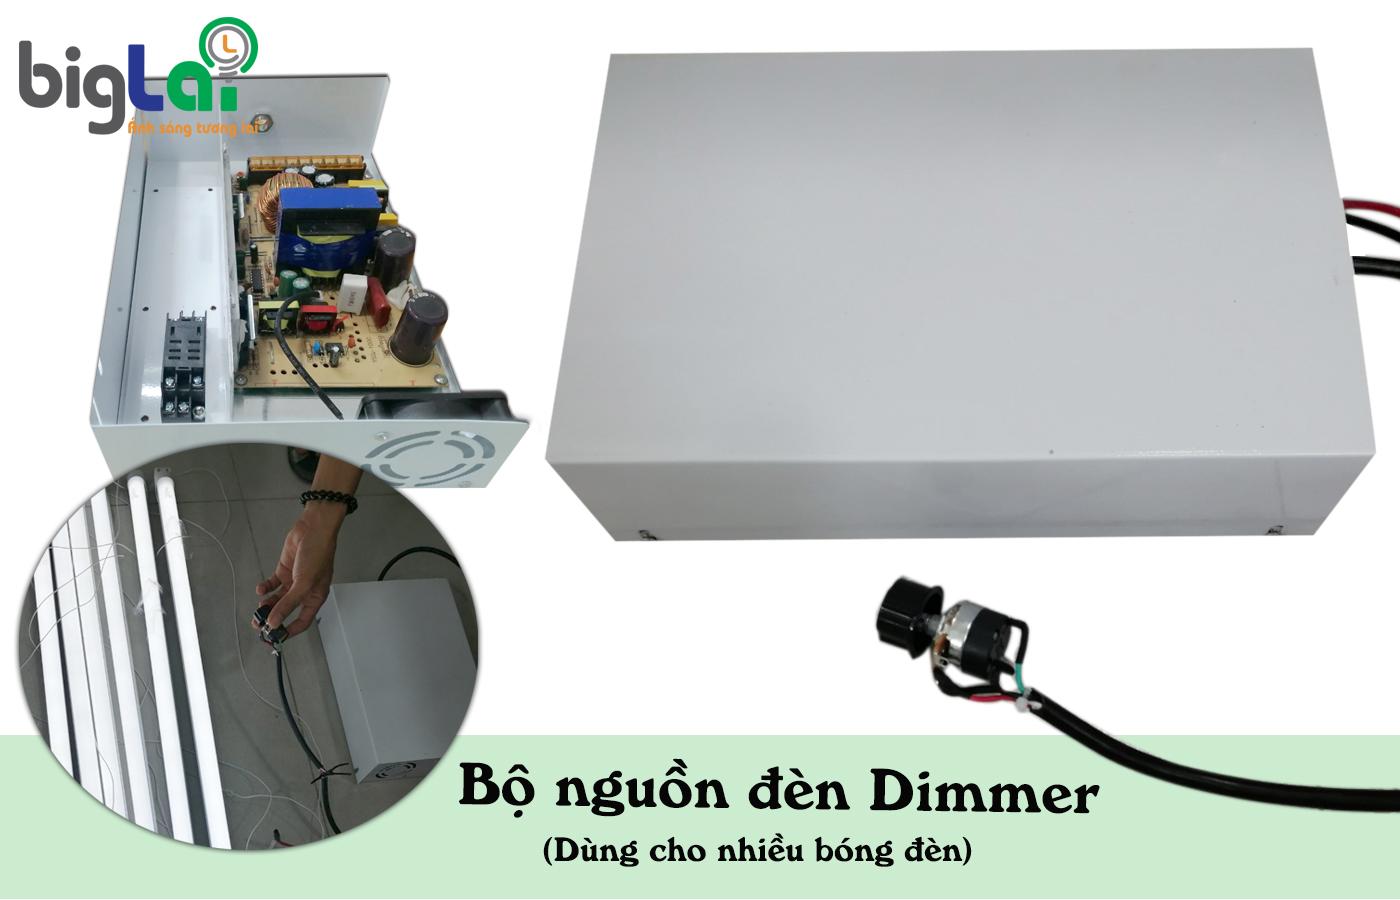 bo-nguon-den-tuyp-led-dimmer-biglai